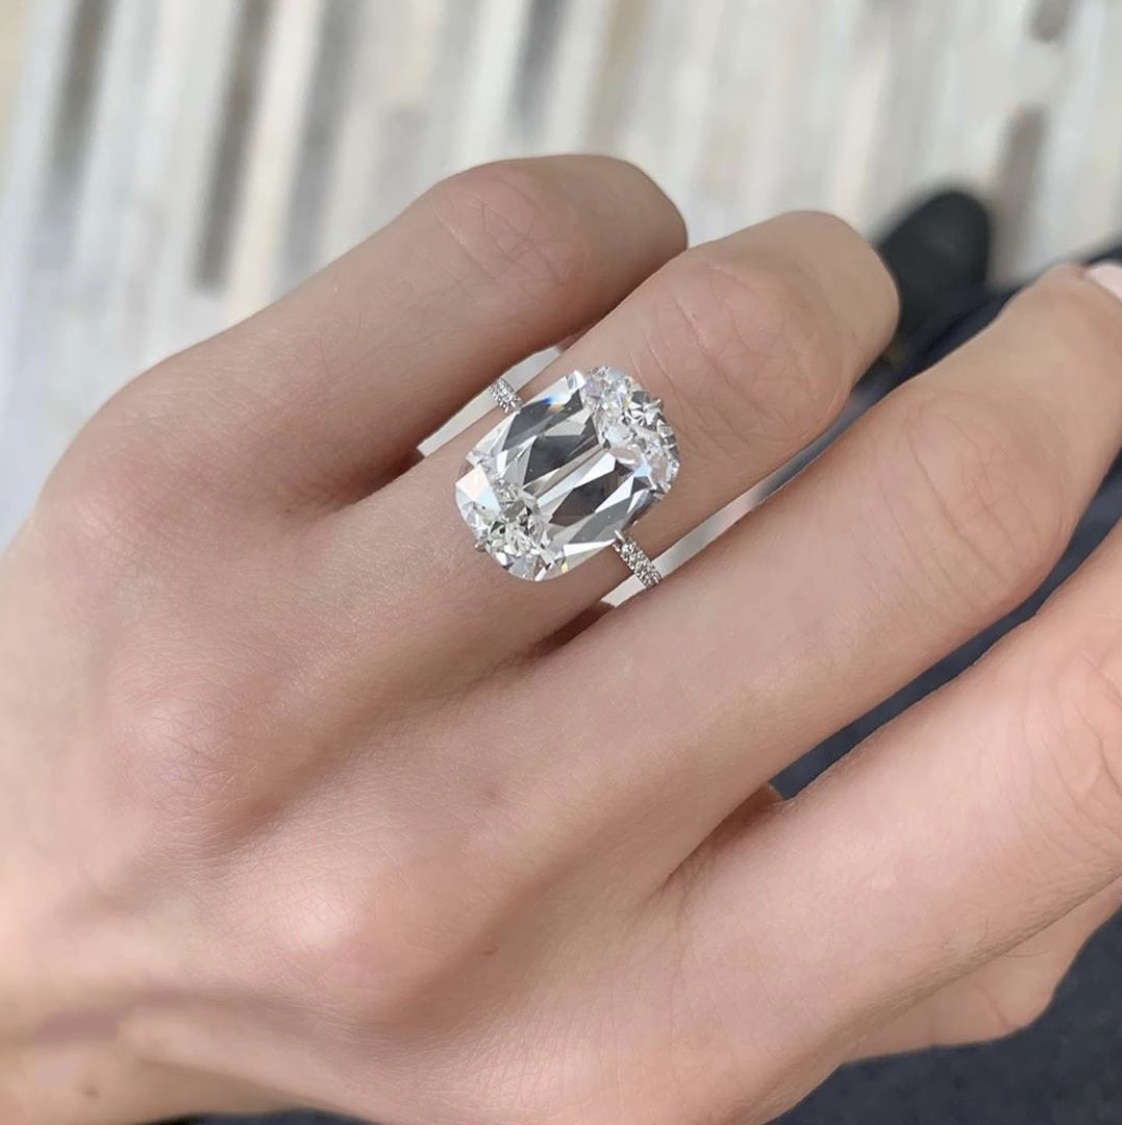 Anillo de compromiso femenino brillante, anillo cuadrado de Plata de Ley 925, anillos de boda de diamante de 5ct para mujeres, joyería nupcial moissanita